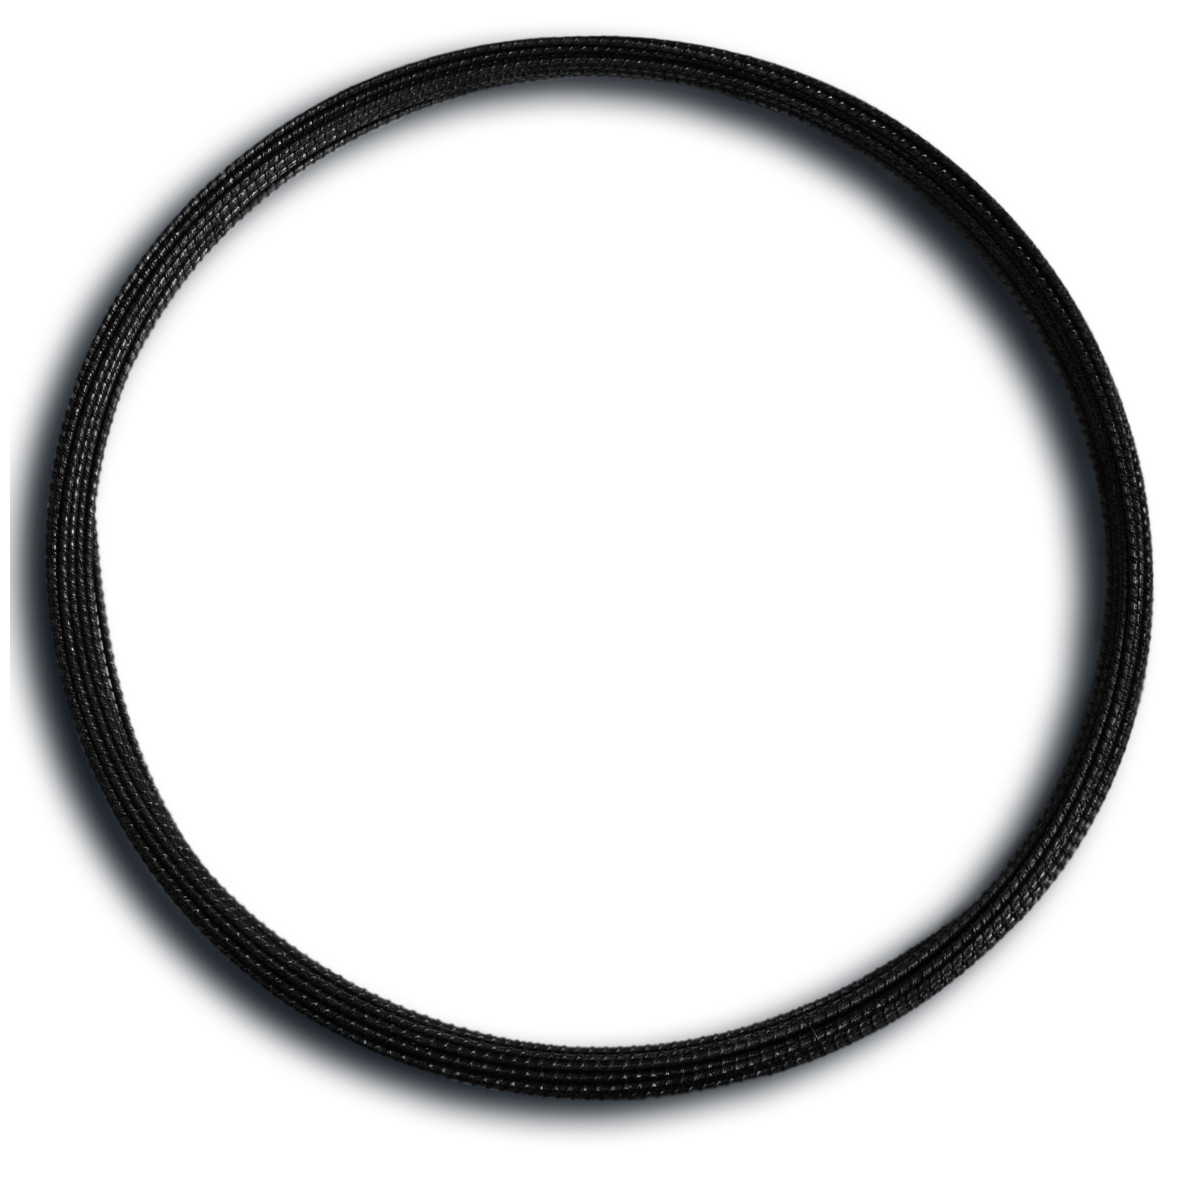 Арматура композитная HARD 8 мм 50 м цвет чёрный